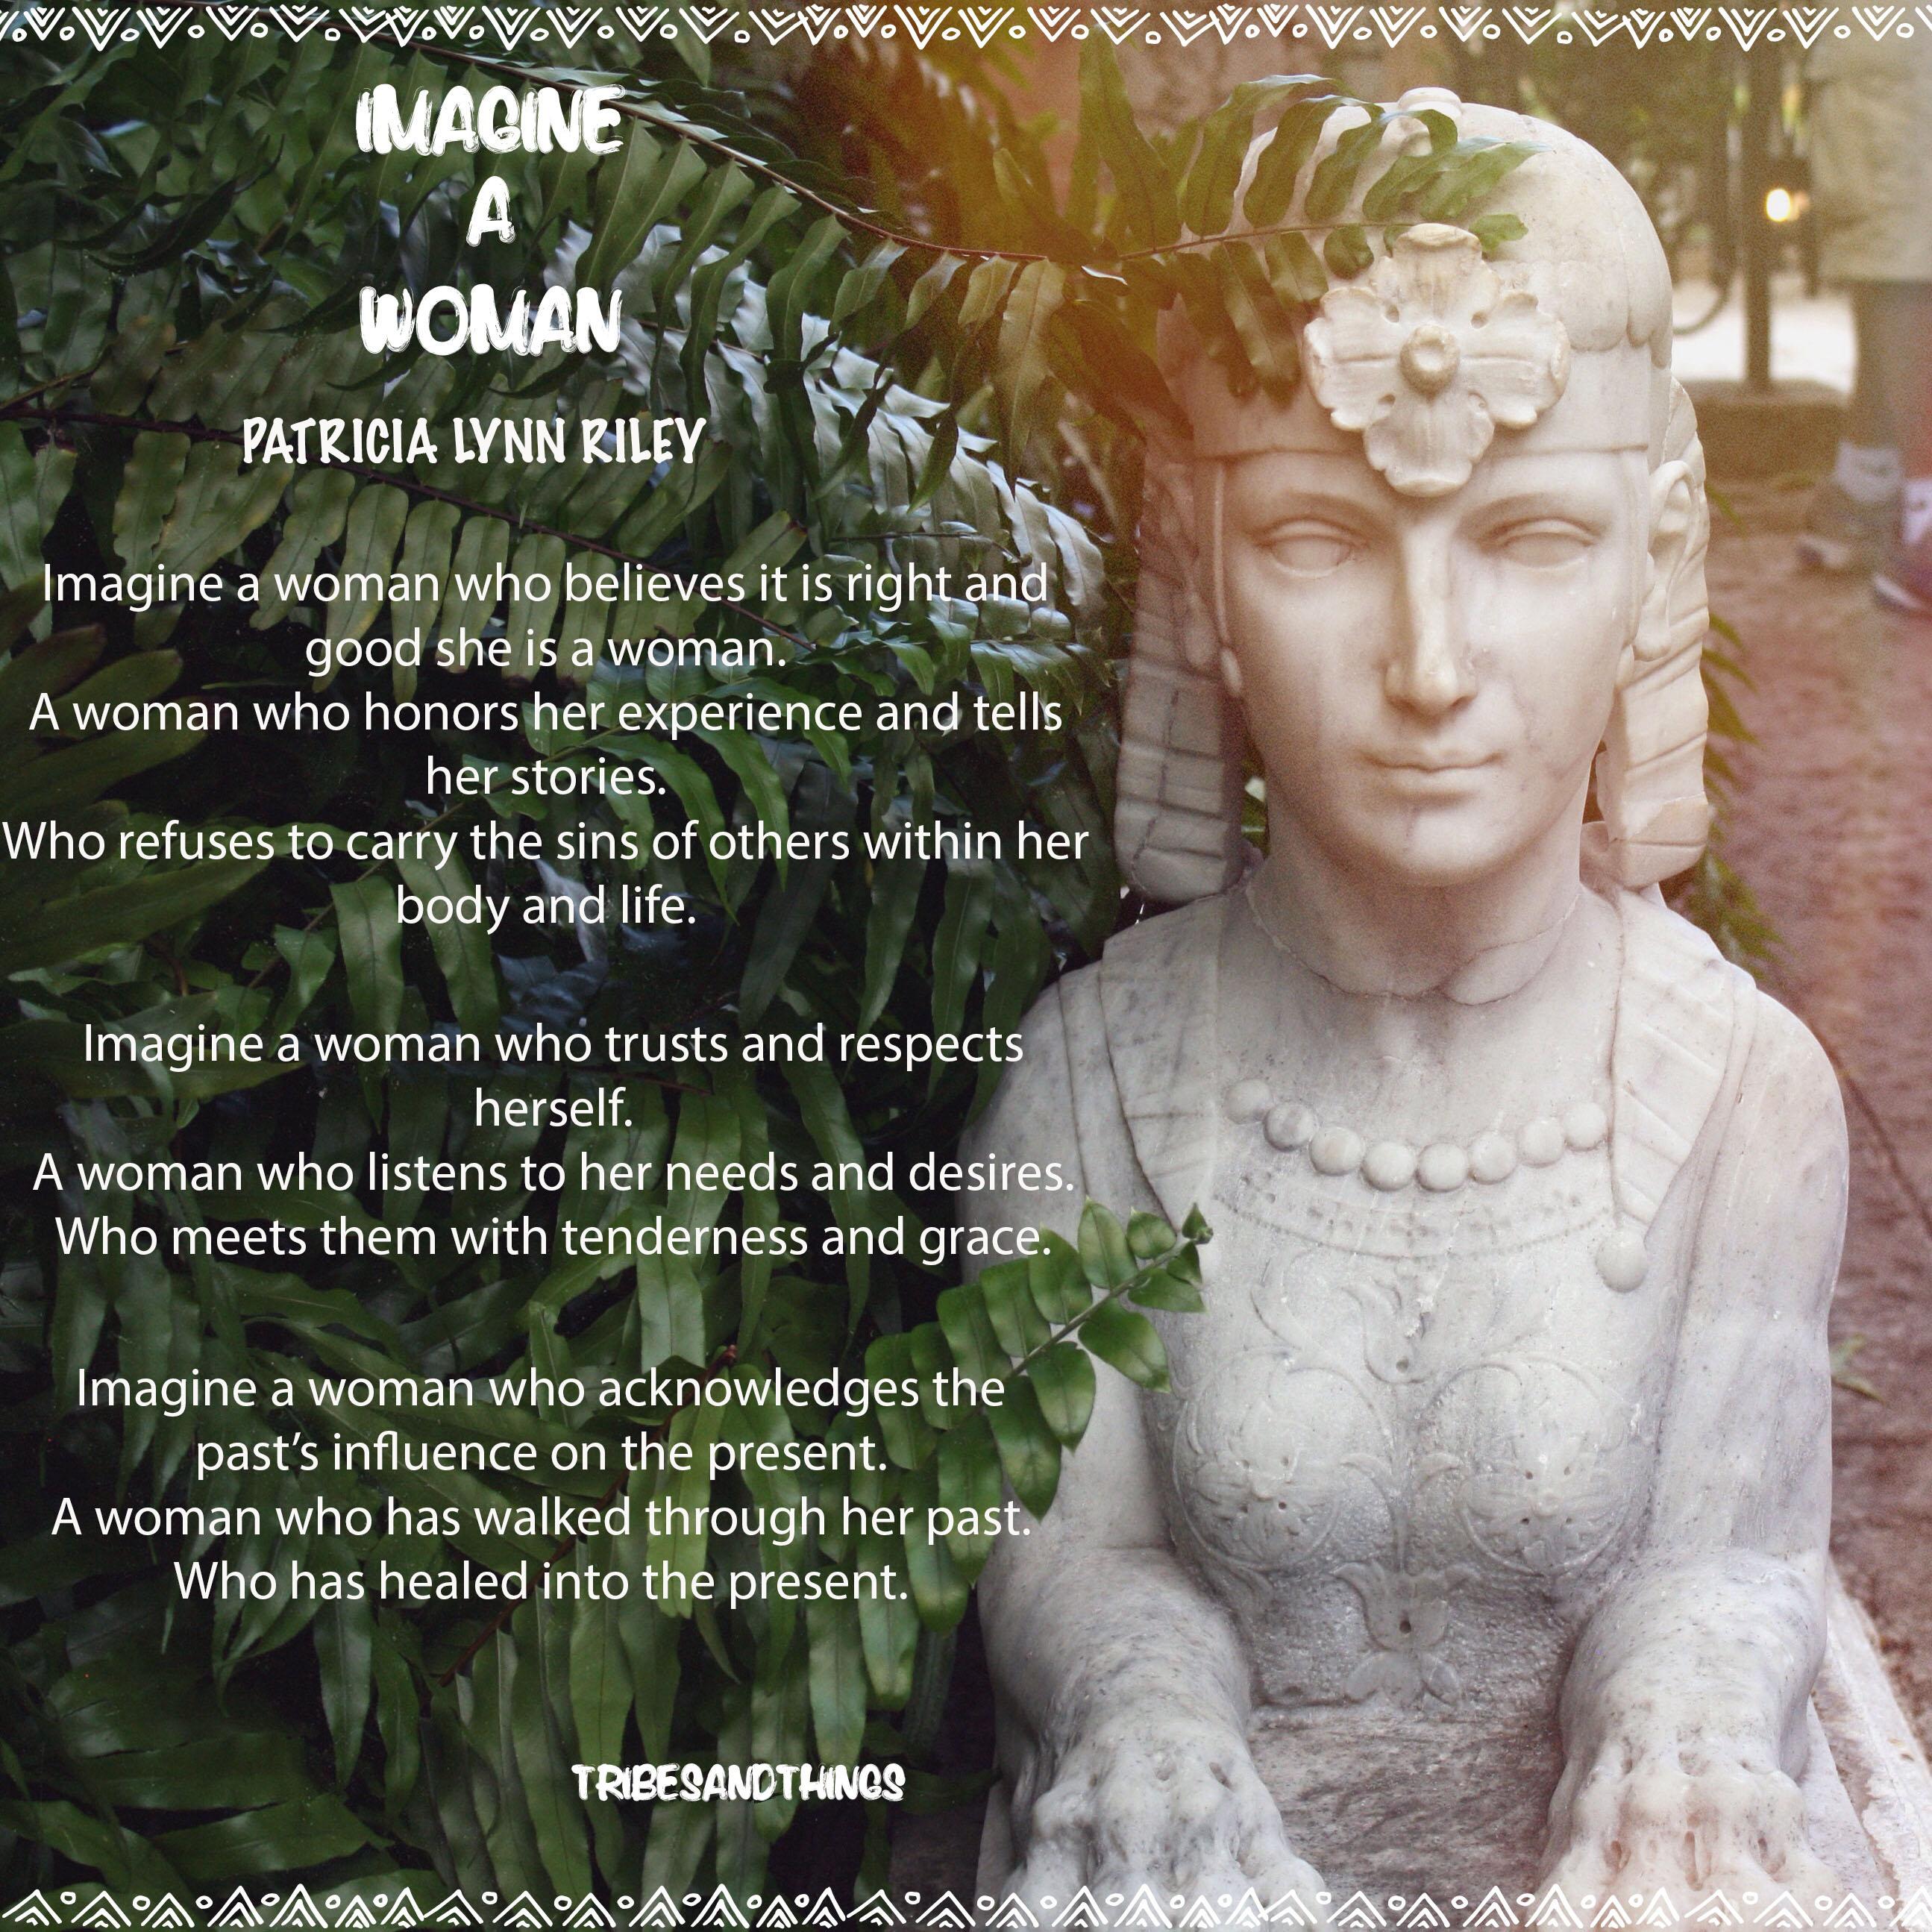 IMAGINE A WOMAN 1